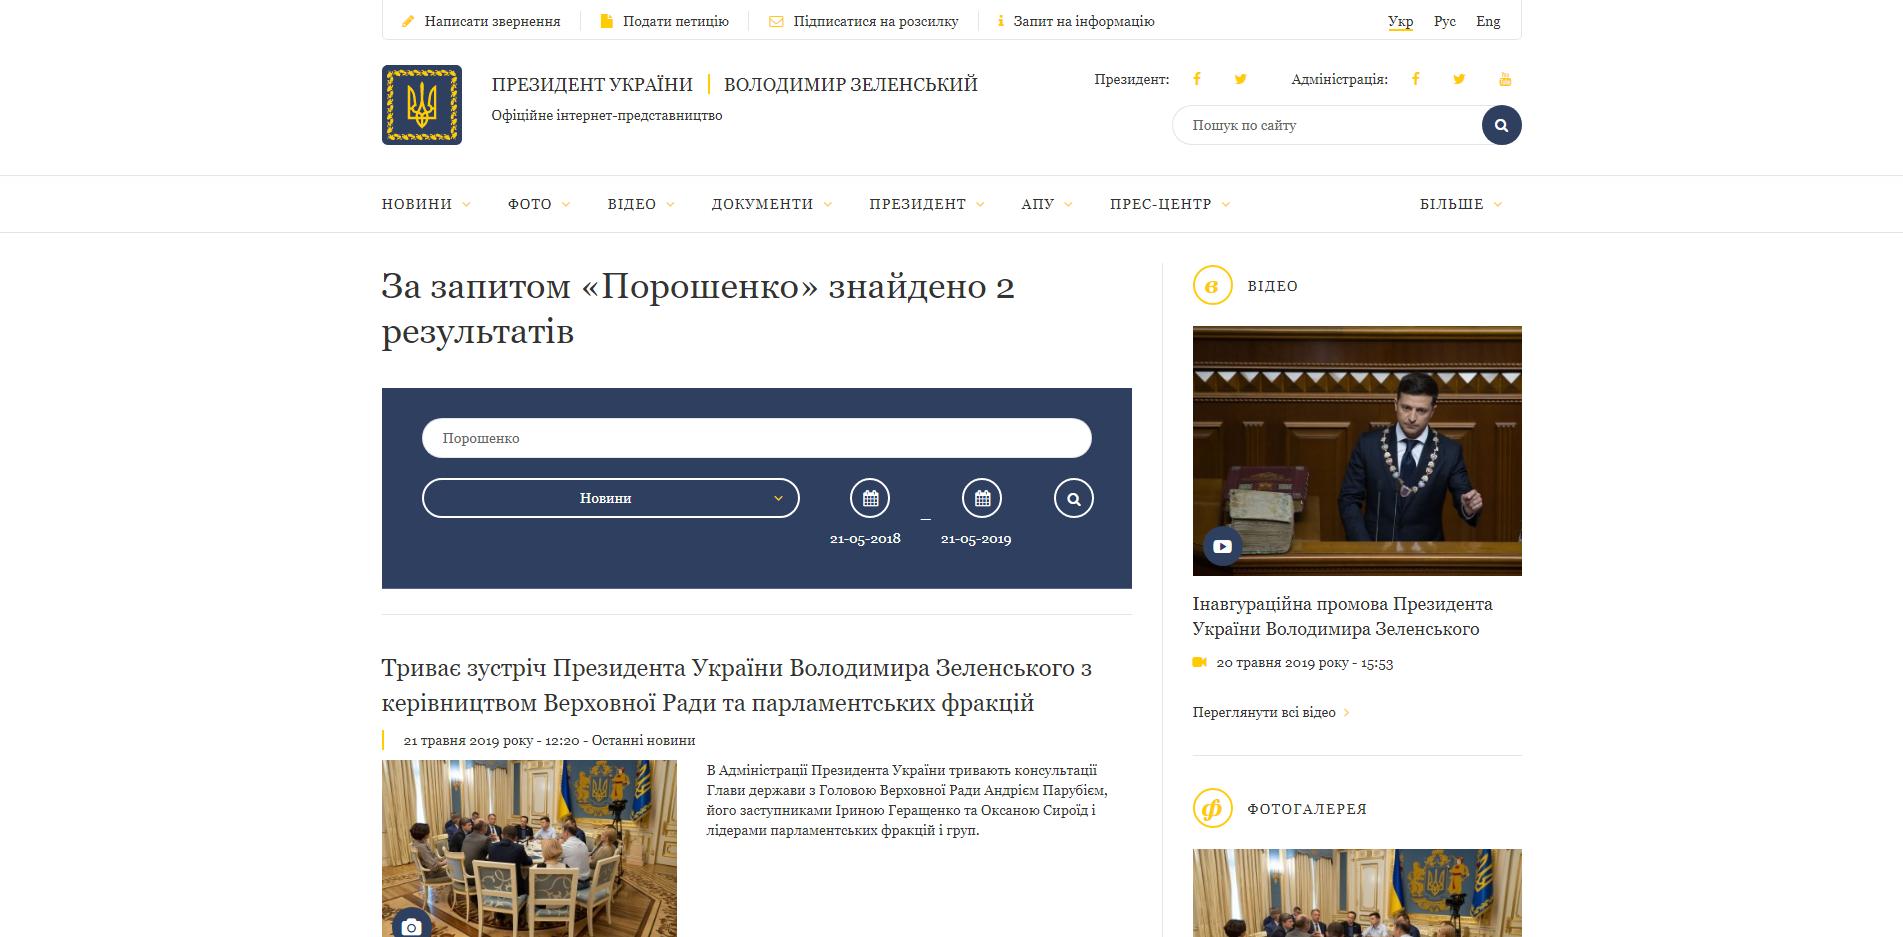 Сайт президента, скріншот